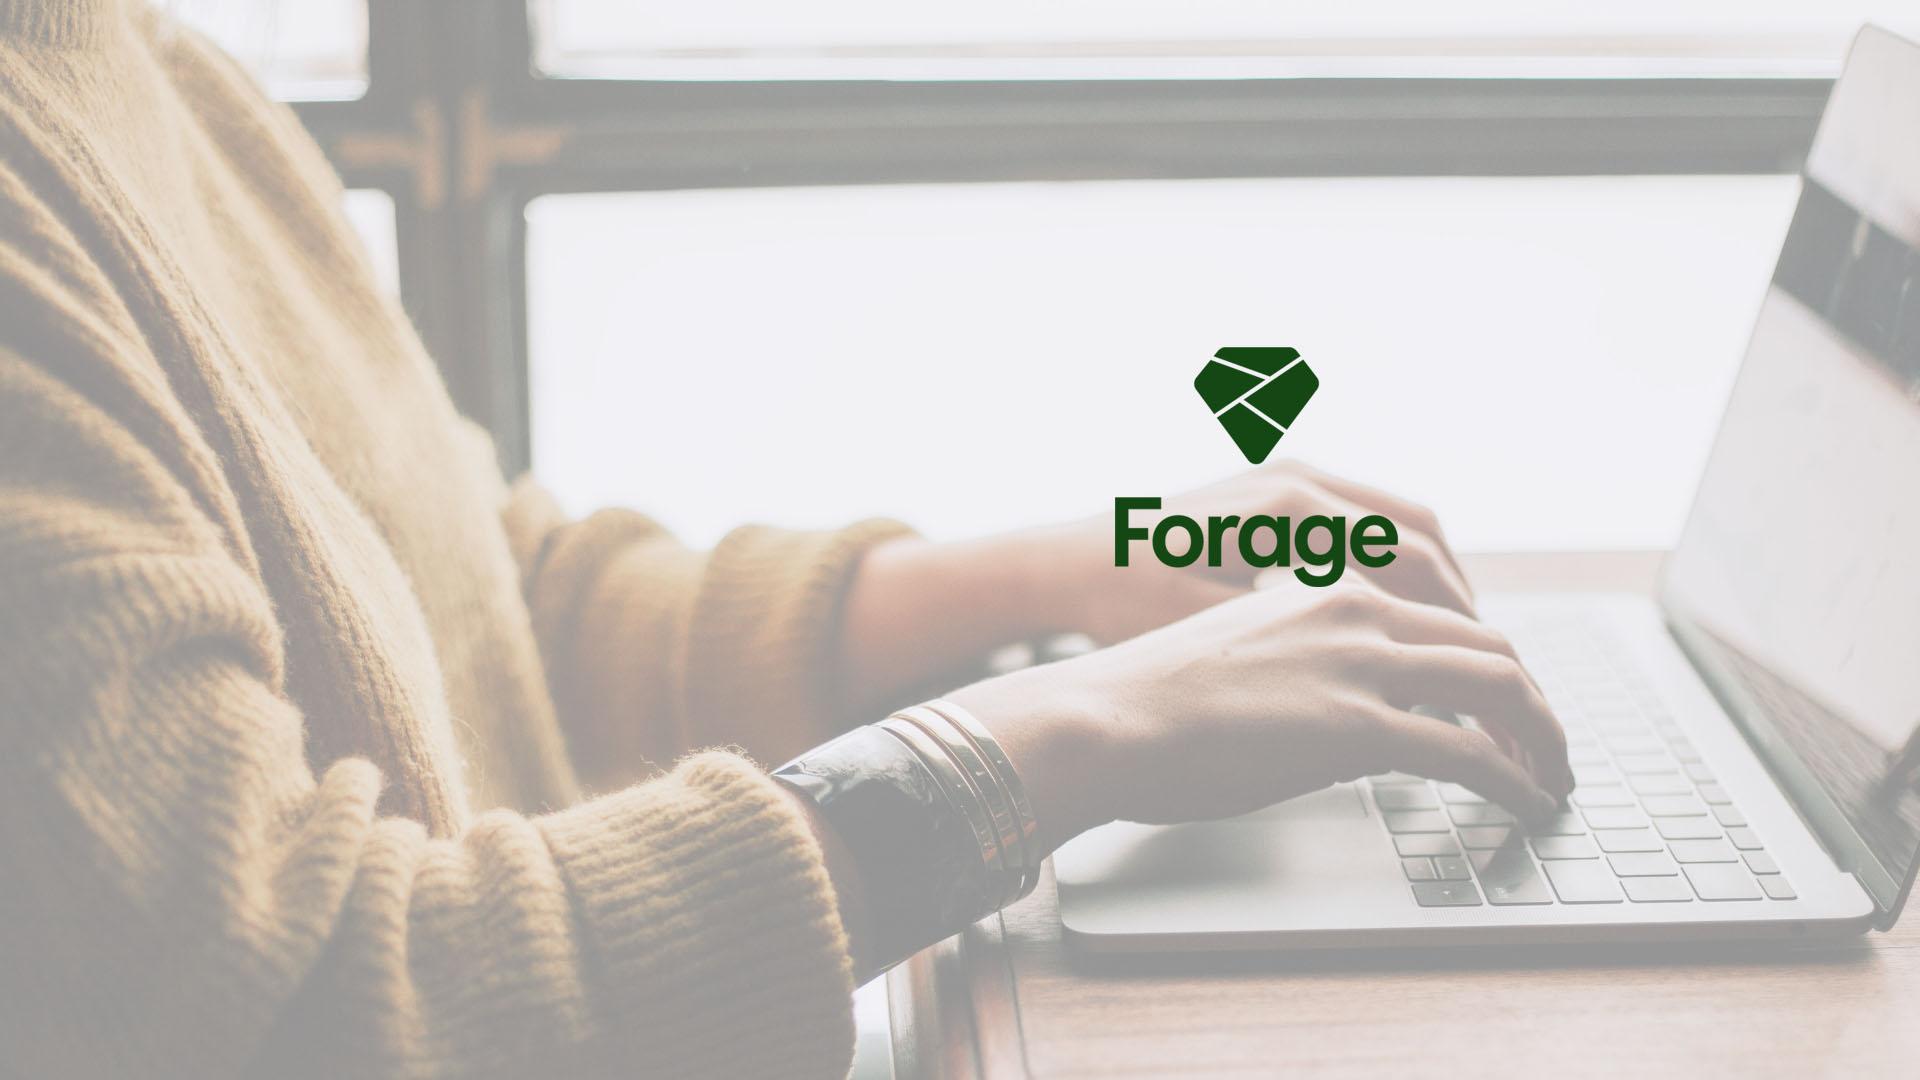 Forage - virtual work experience programs